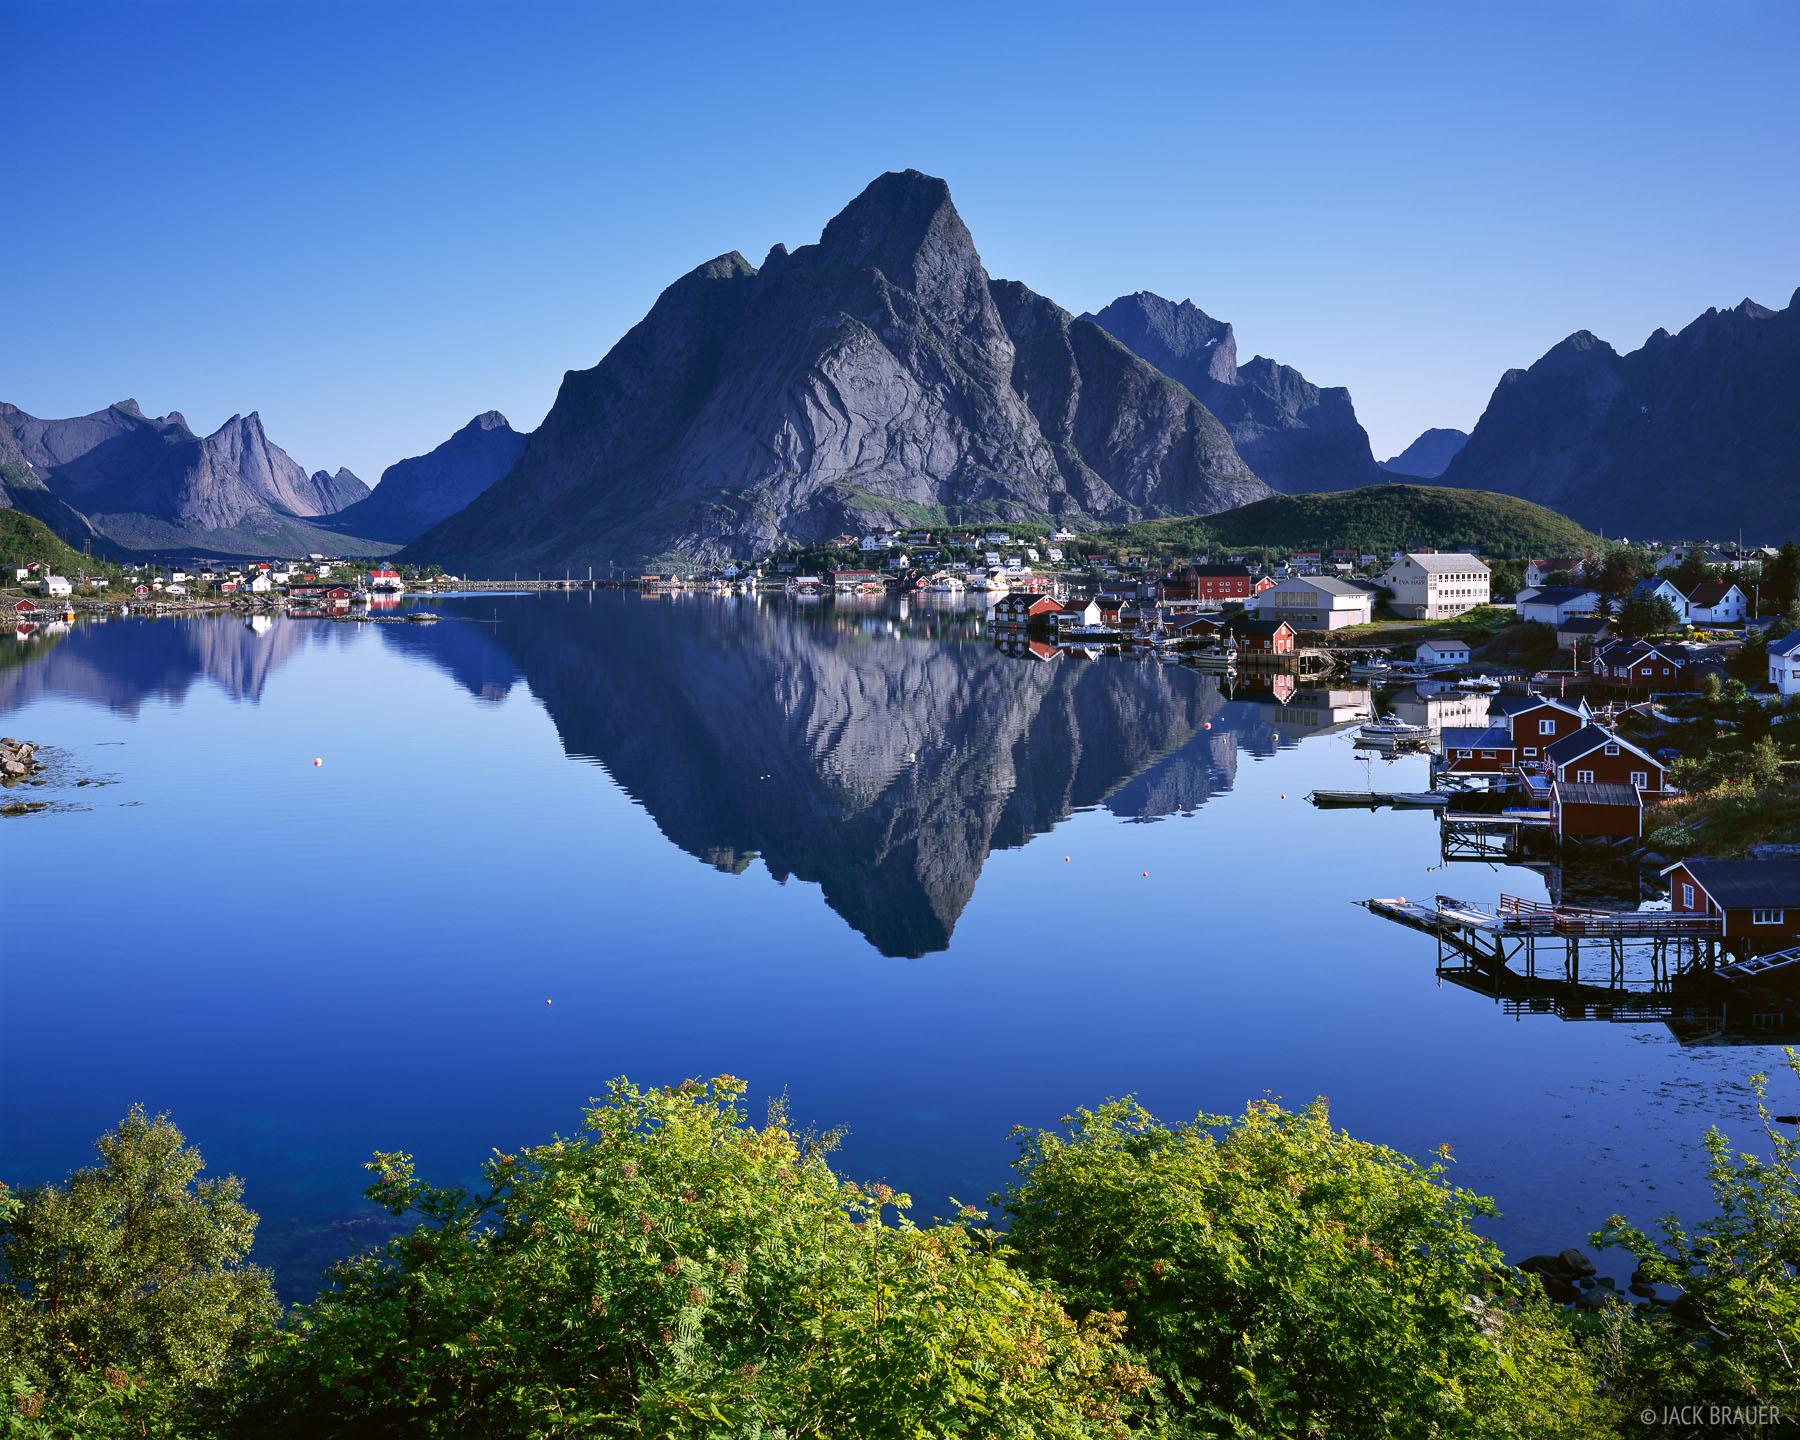 Hd Puzzle Wallpaper Reine Reflection Lofoten Norway Mountain Photography